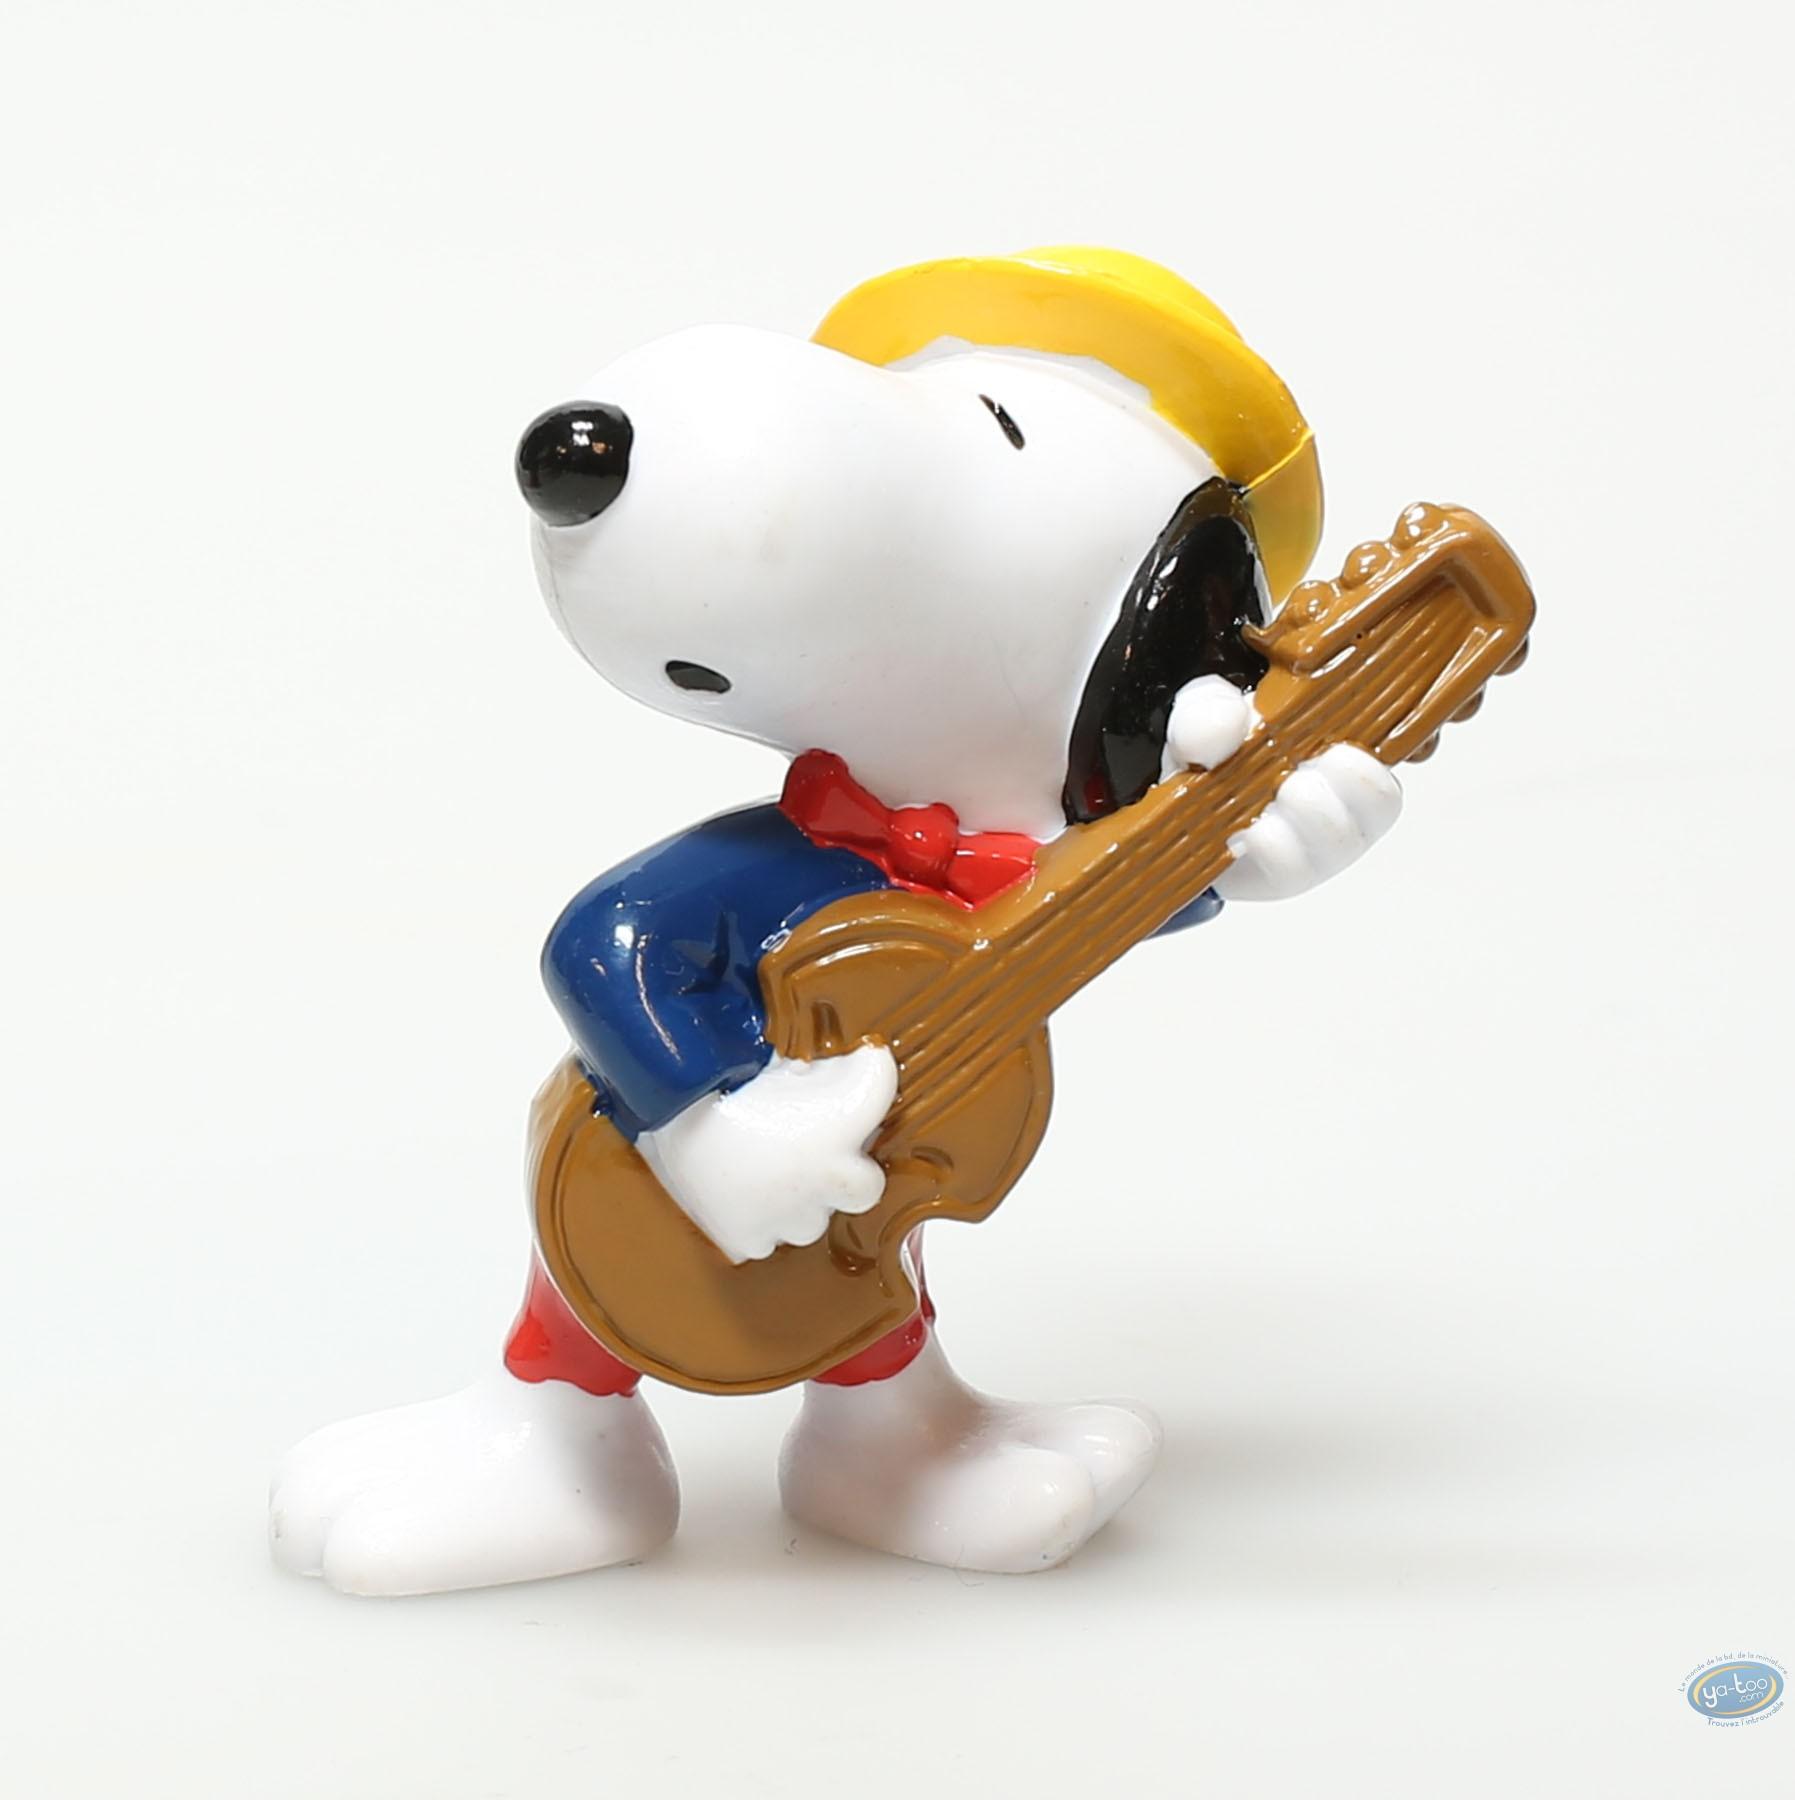 Plastic Figurine, Snoopy : Plastic figure, Schulz, Snoopy : Snoopy guitar player